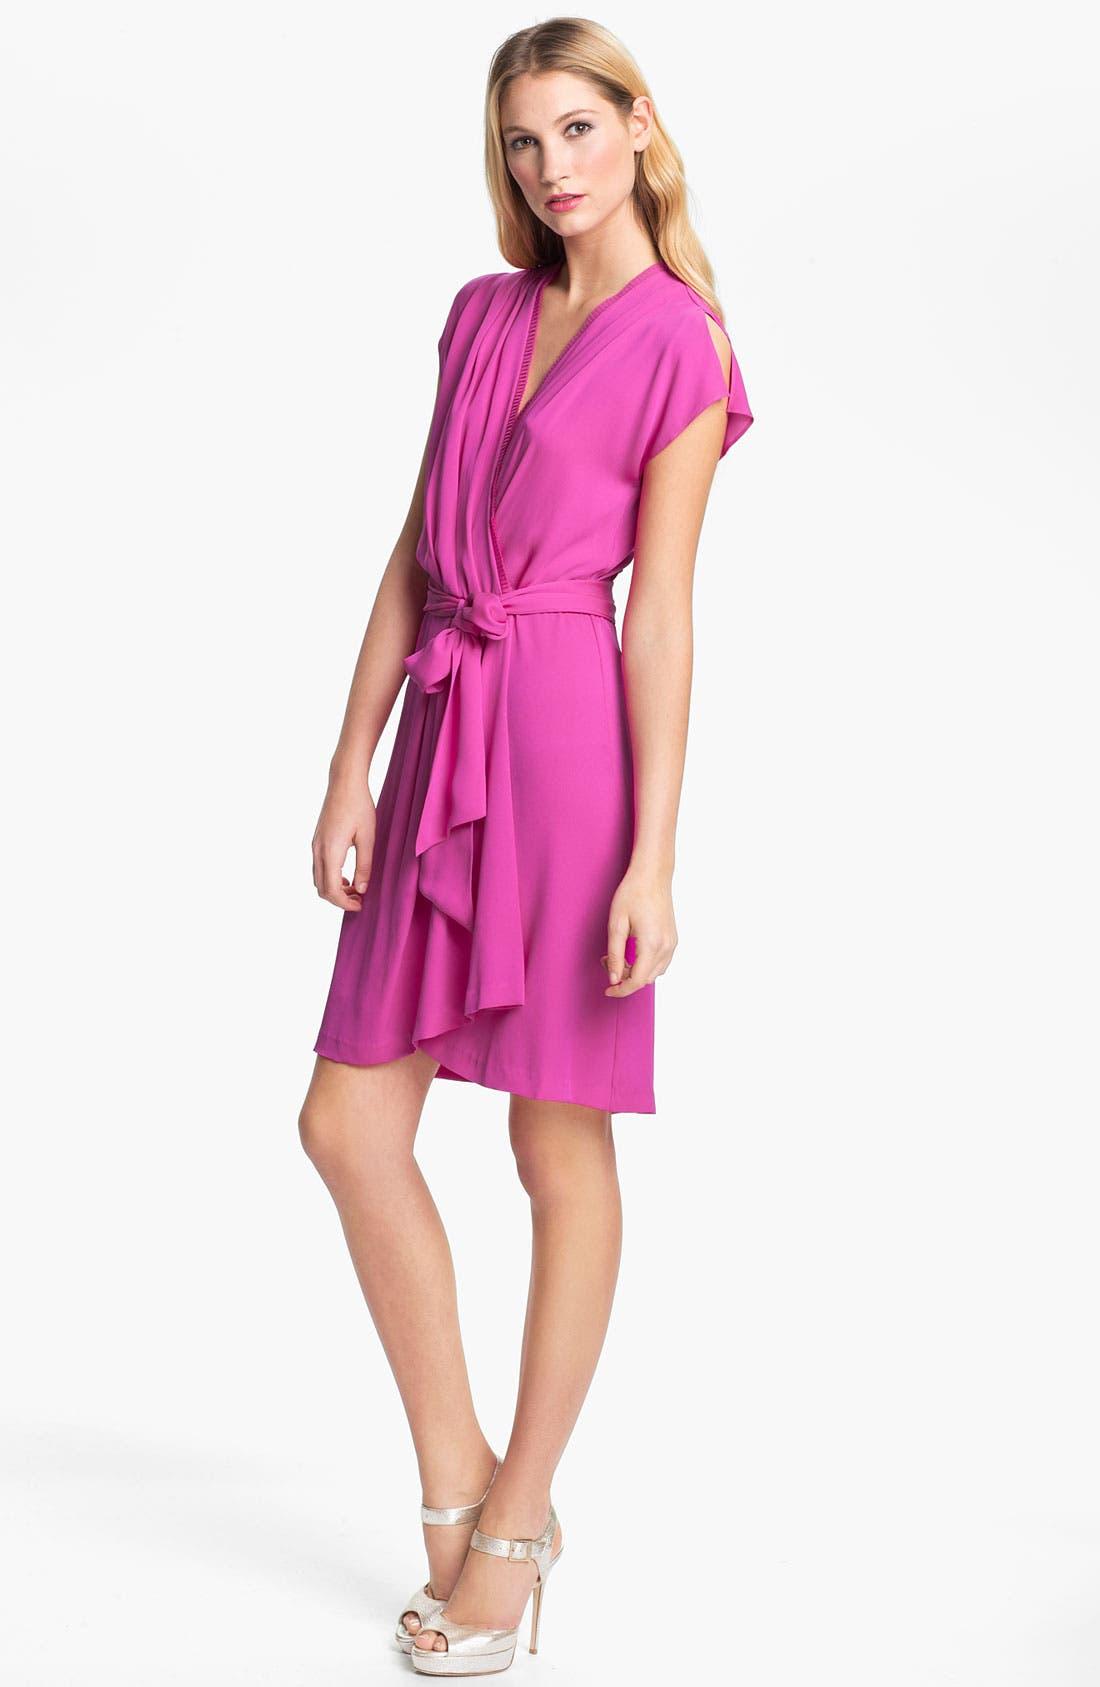 Alternate Image 1 Selected - Diane von Furstenberg 'Mateo' Stretch Silk Wrap Dress